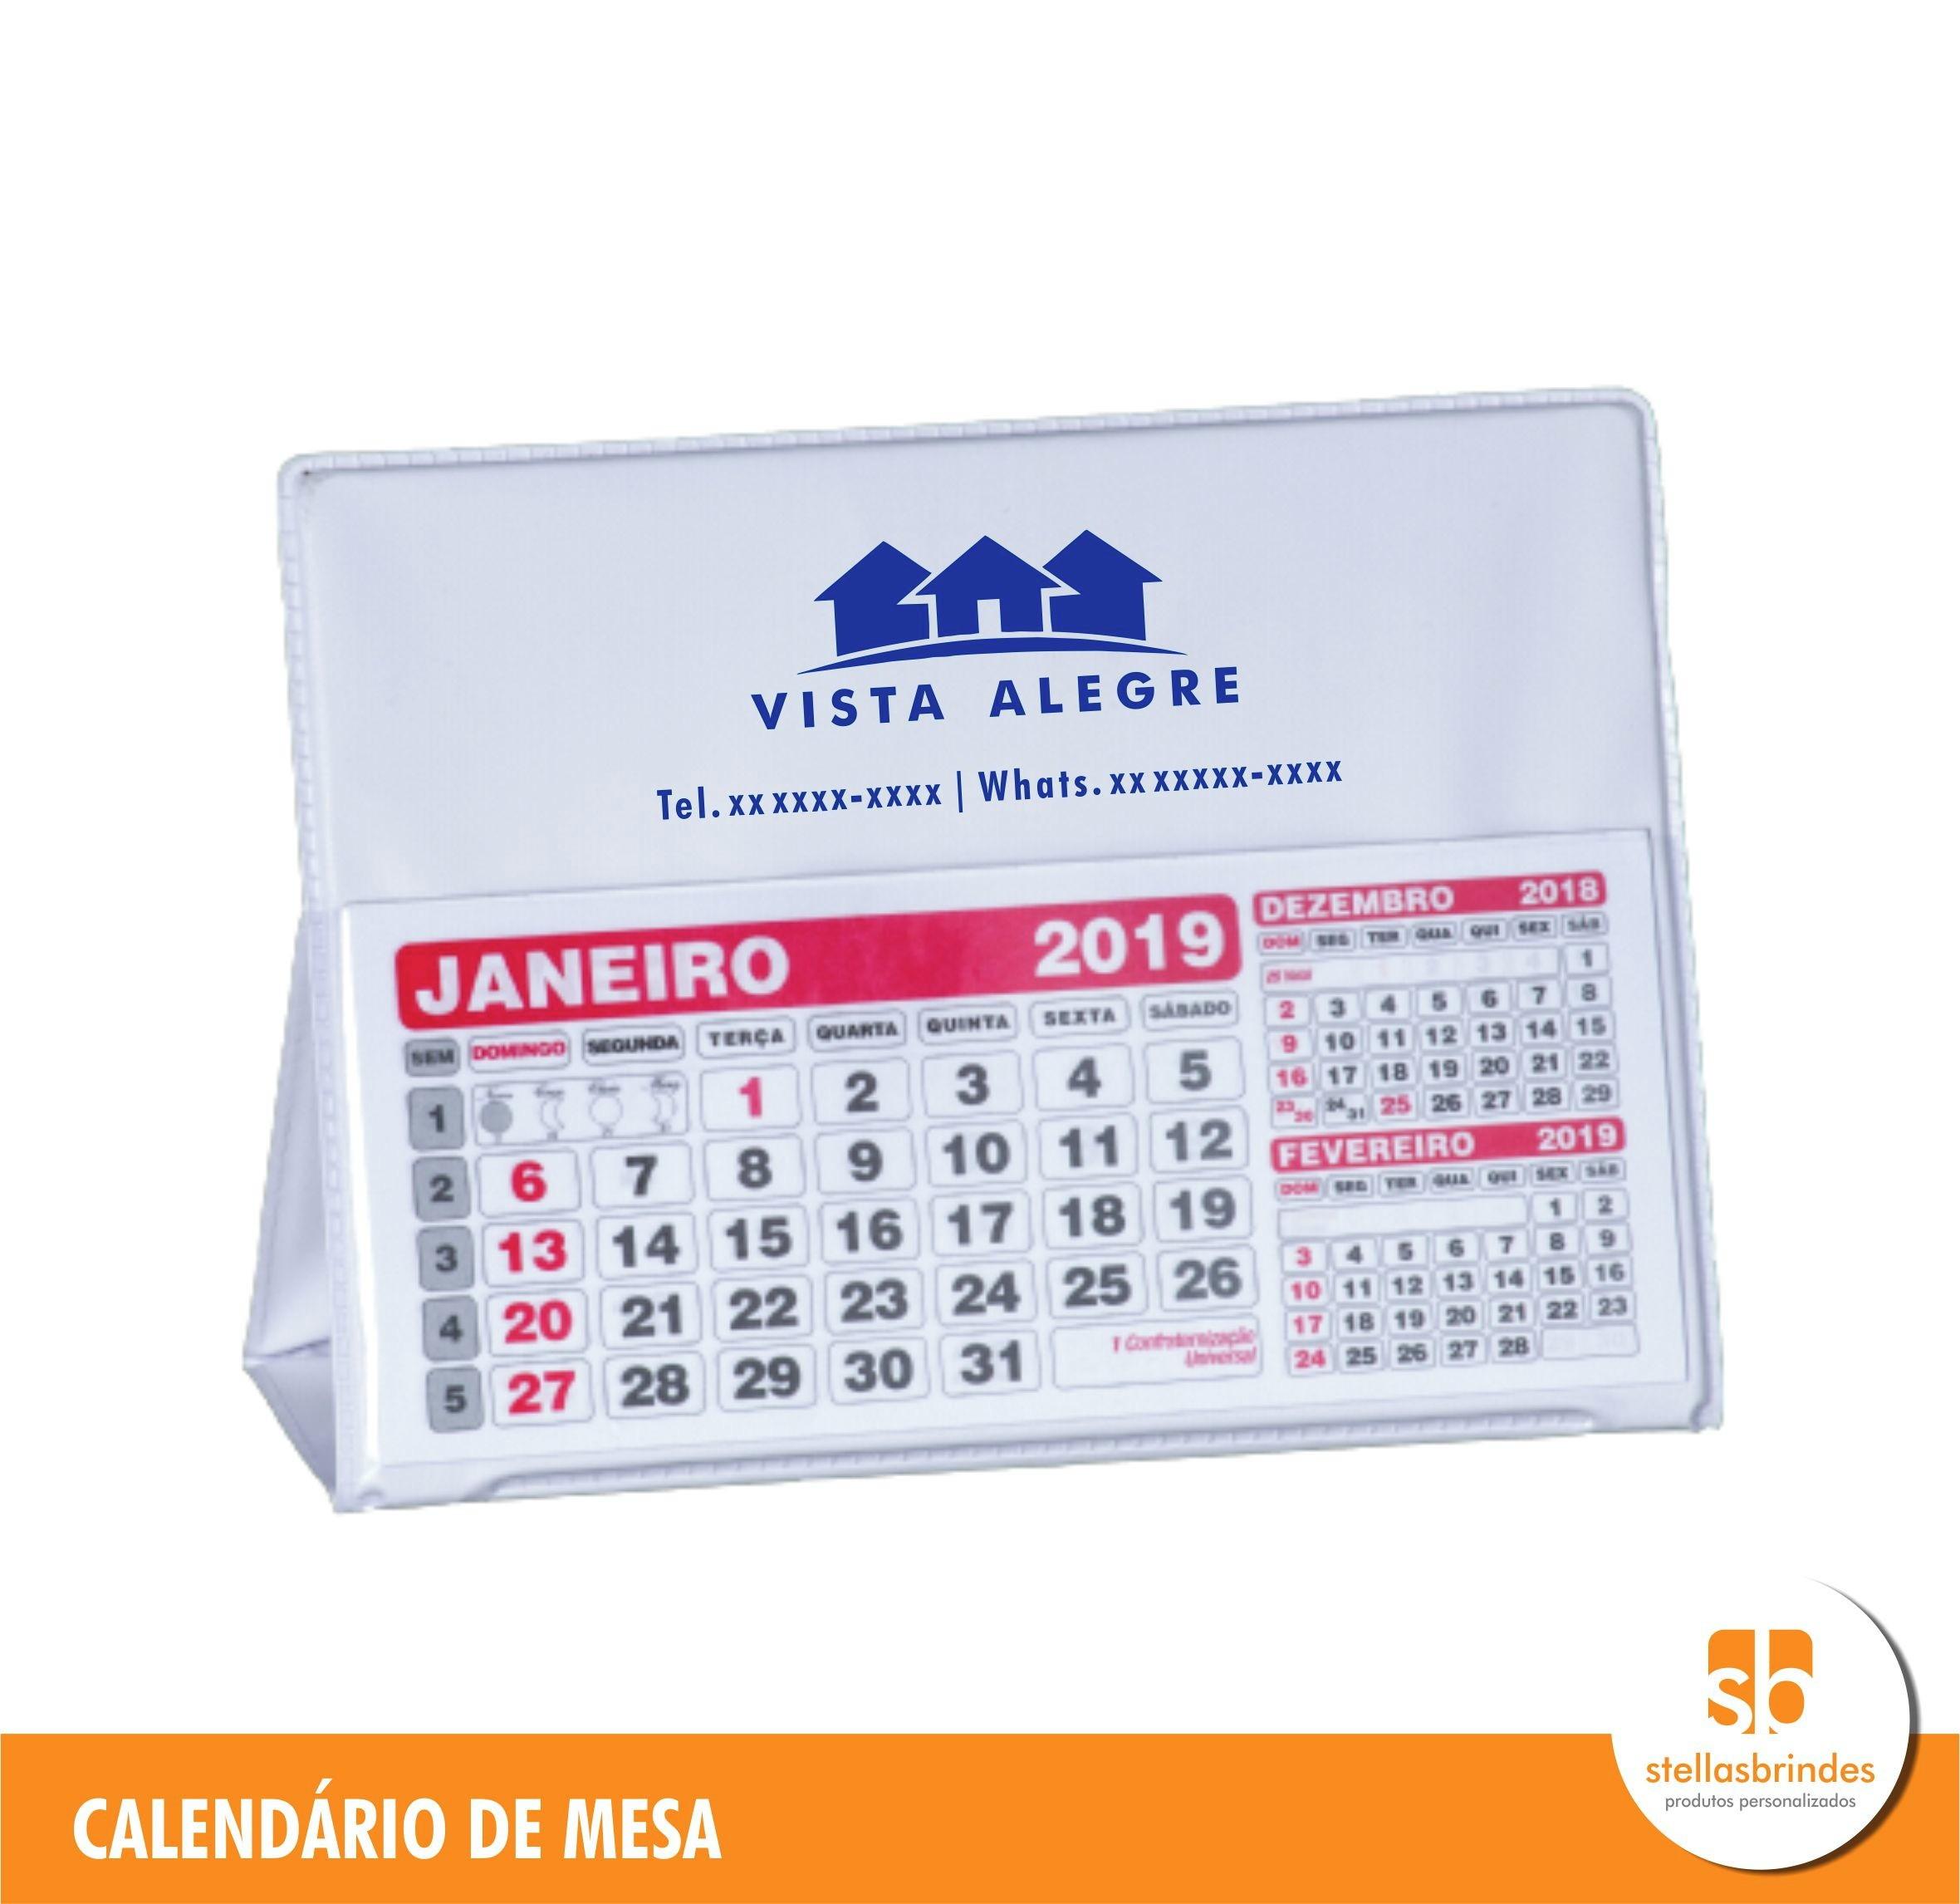 calendario de mesa 2019 personalizado a partir de 500 und brindes promocionais